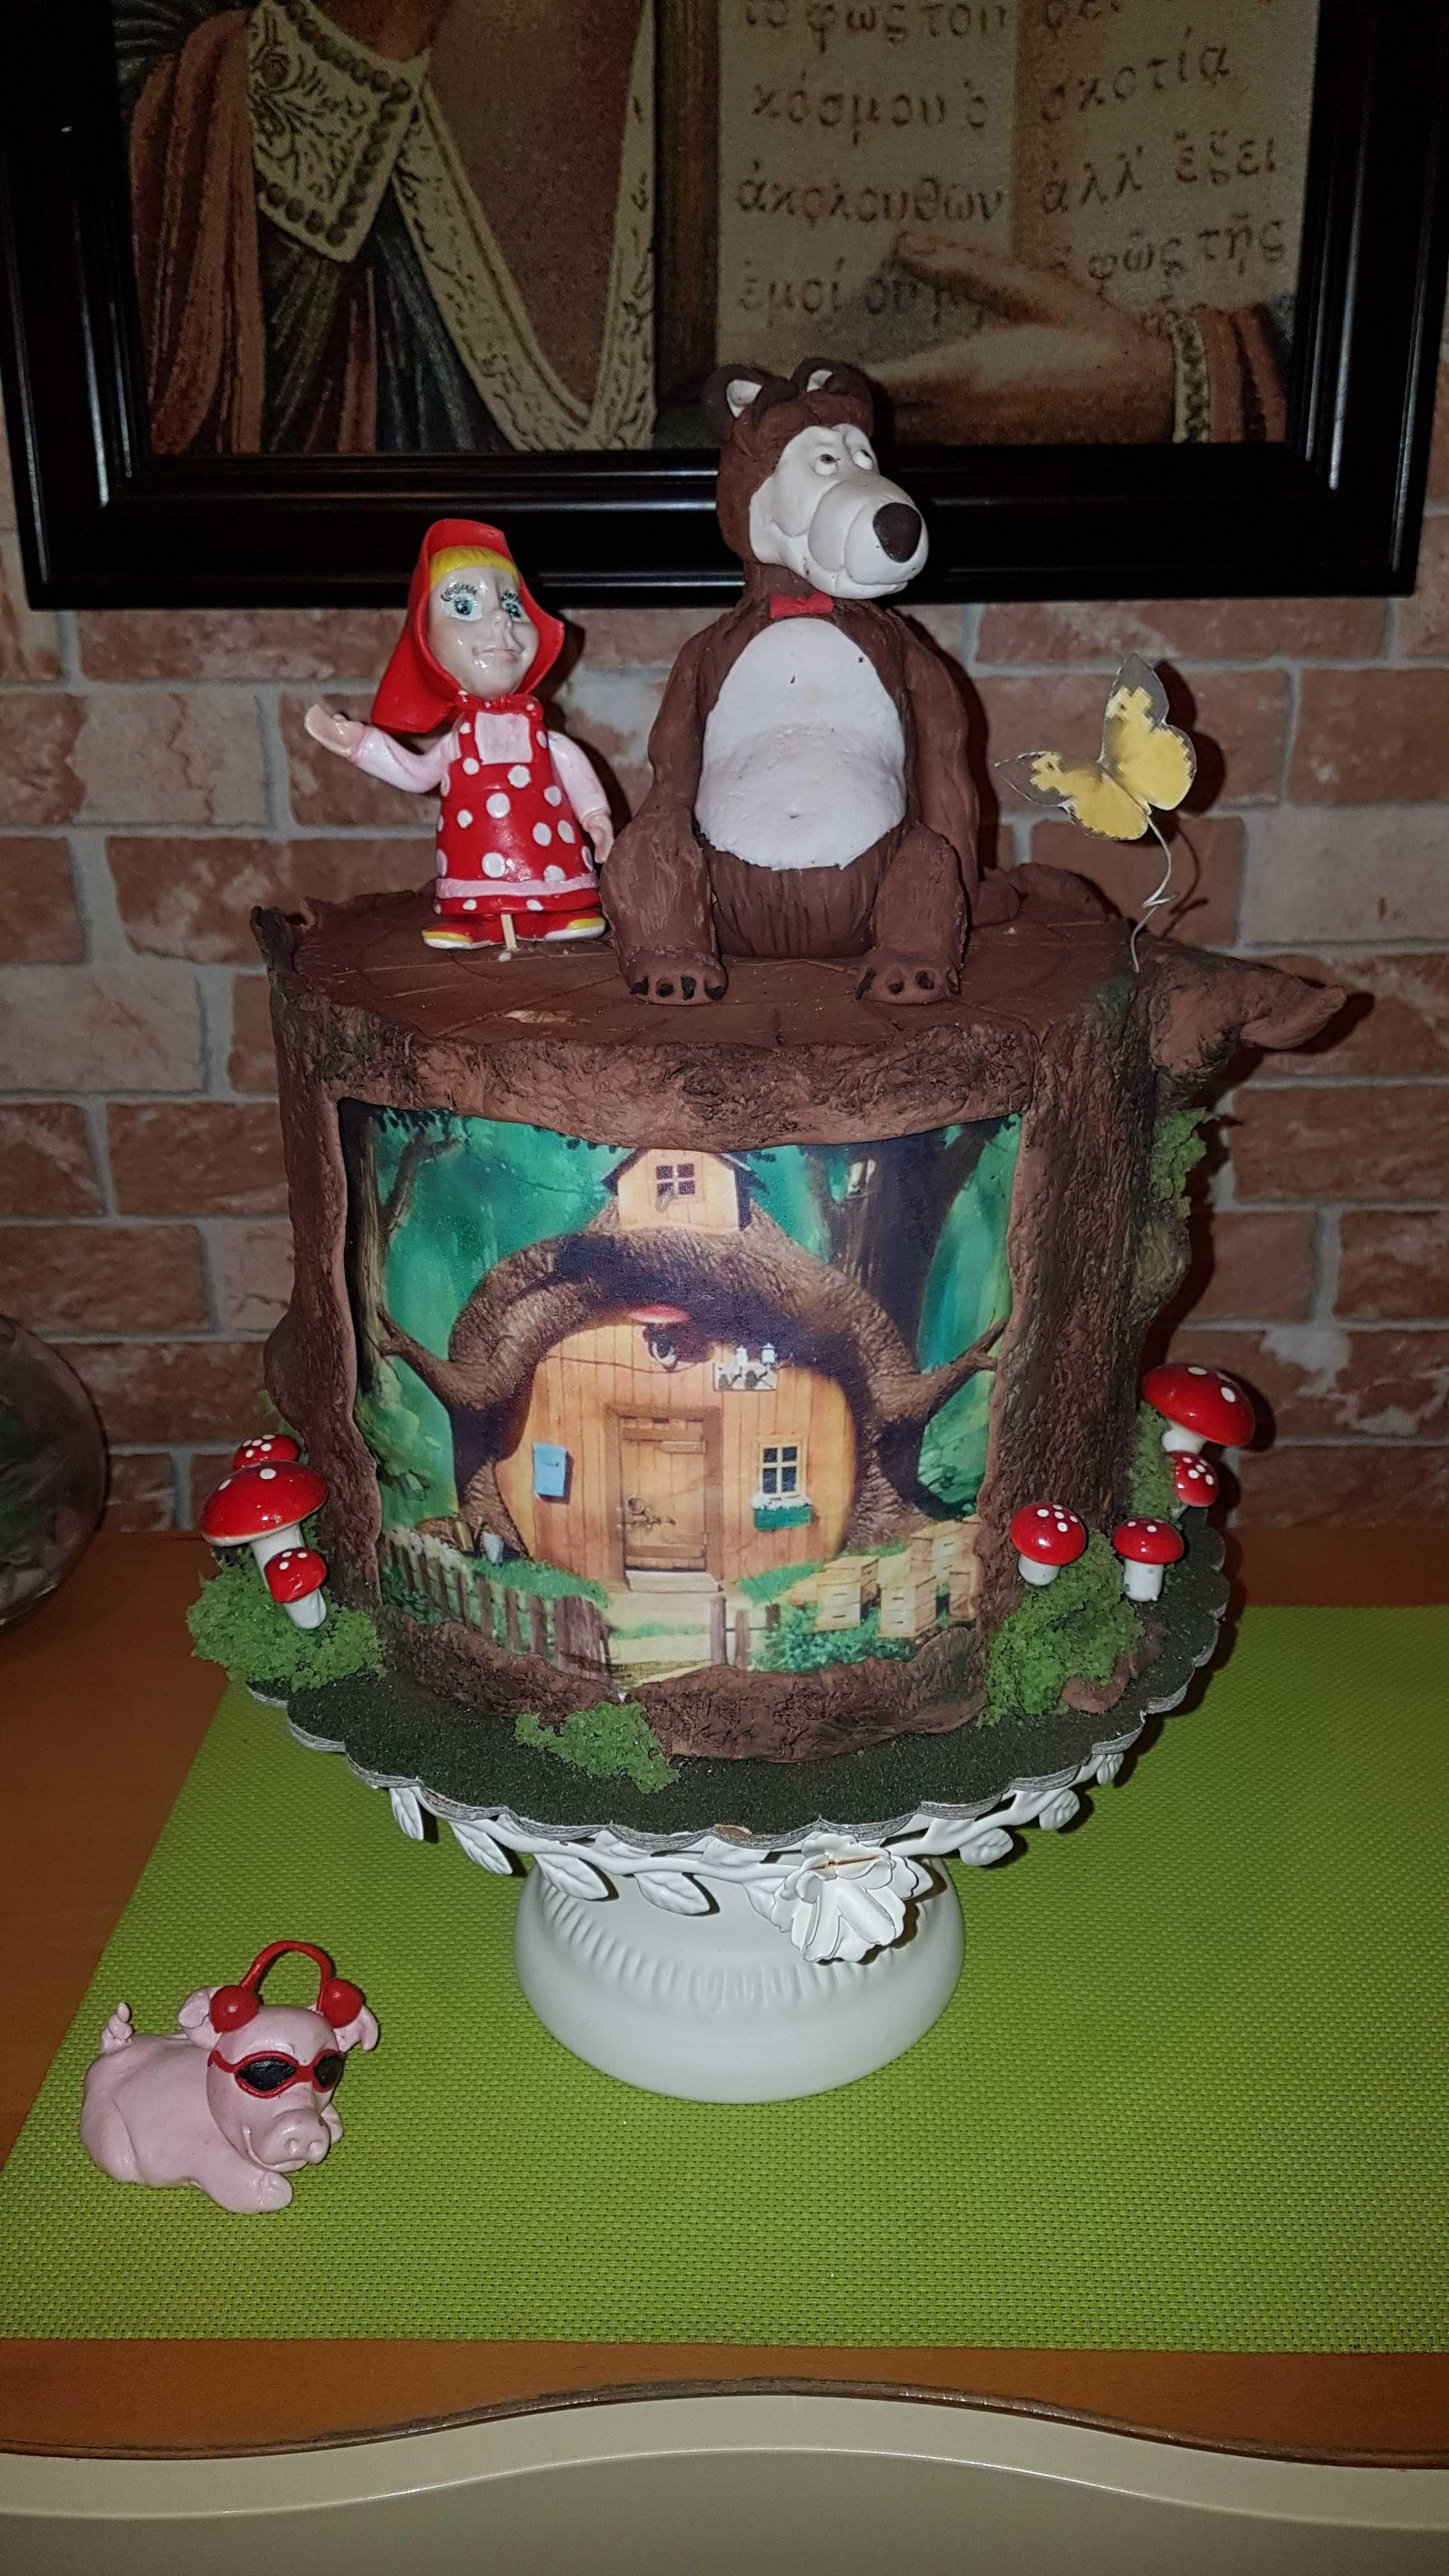 Пинята super mario ,папагал и балон маша ,пират  торта Маша и мечока